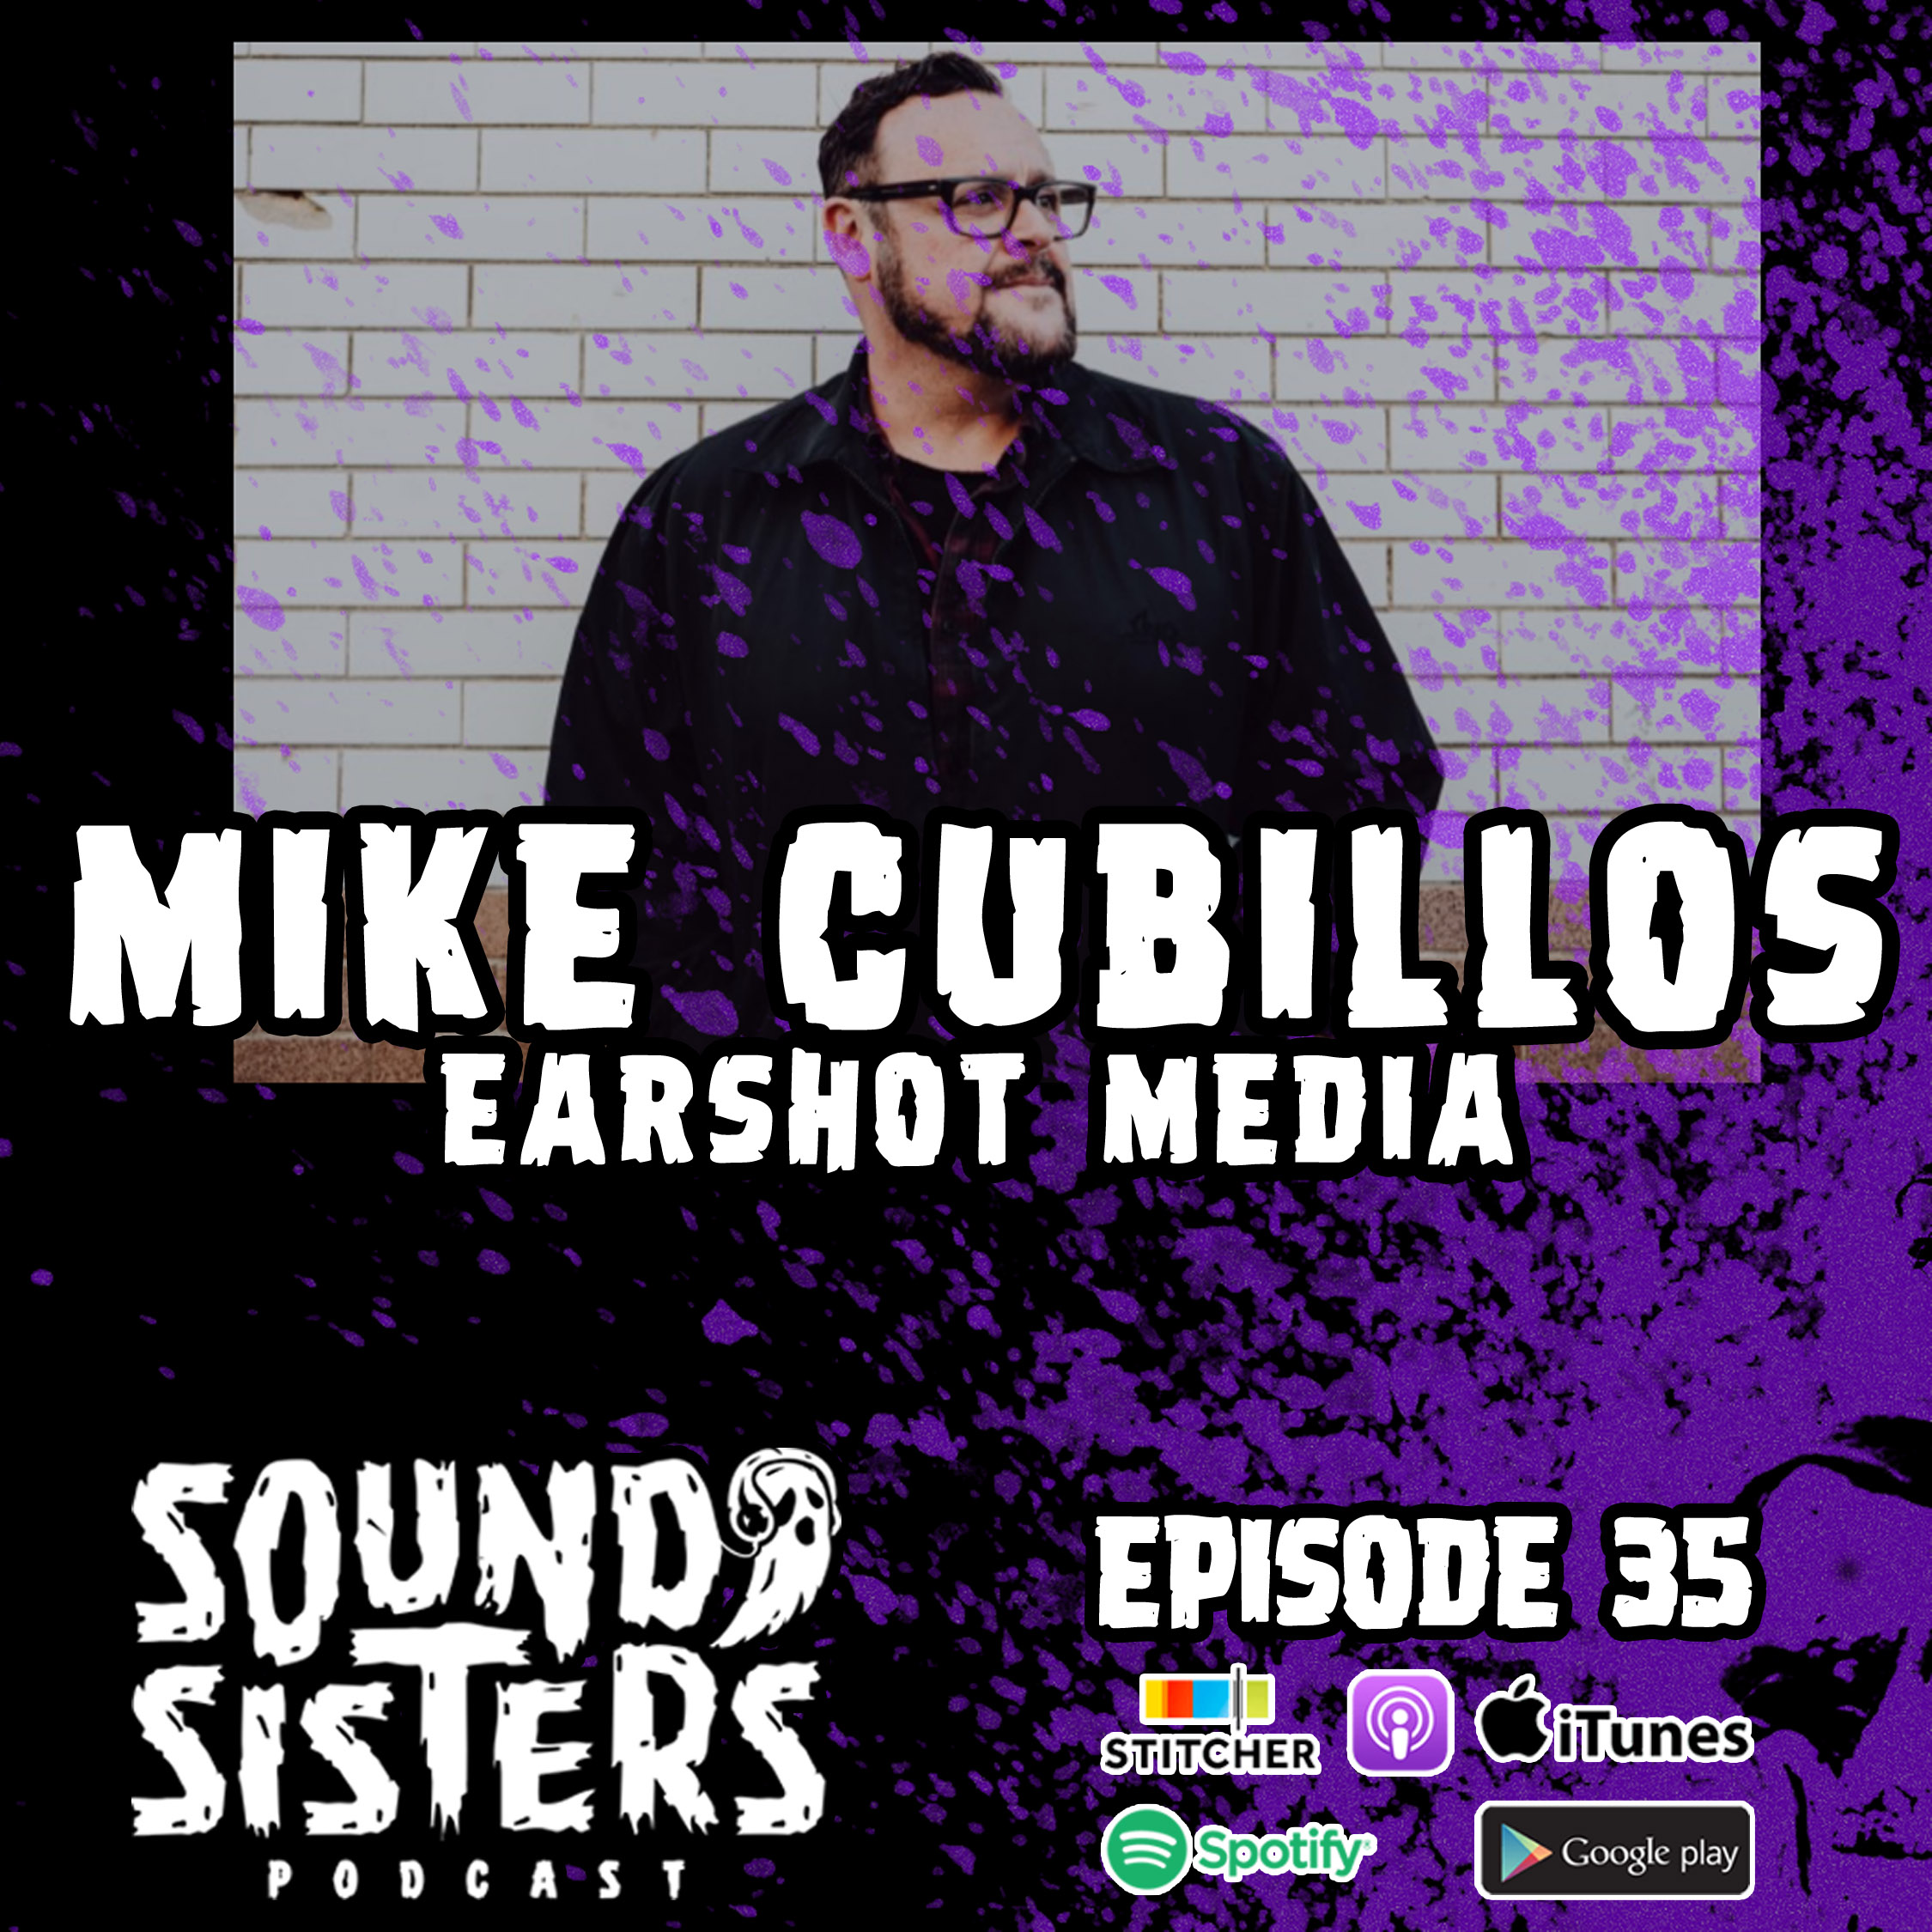 Sound Sisters 35 – Mike Cubillos of Earshot Media